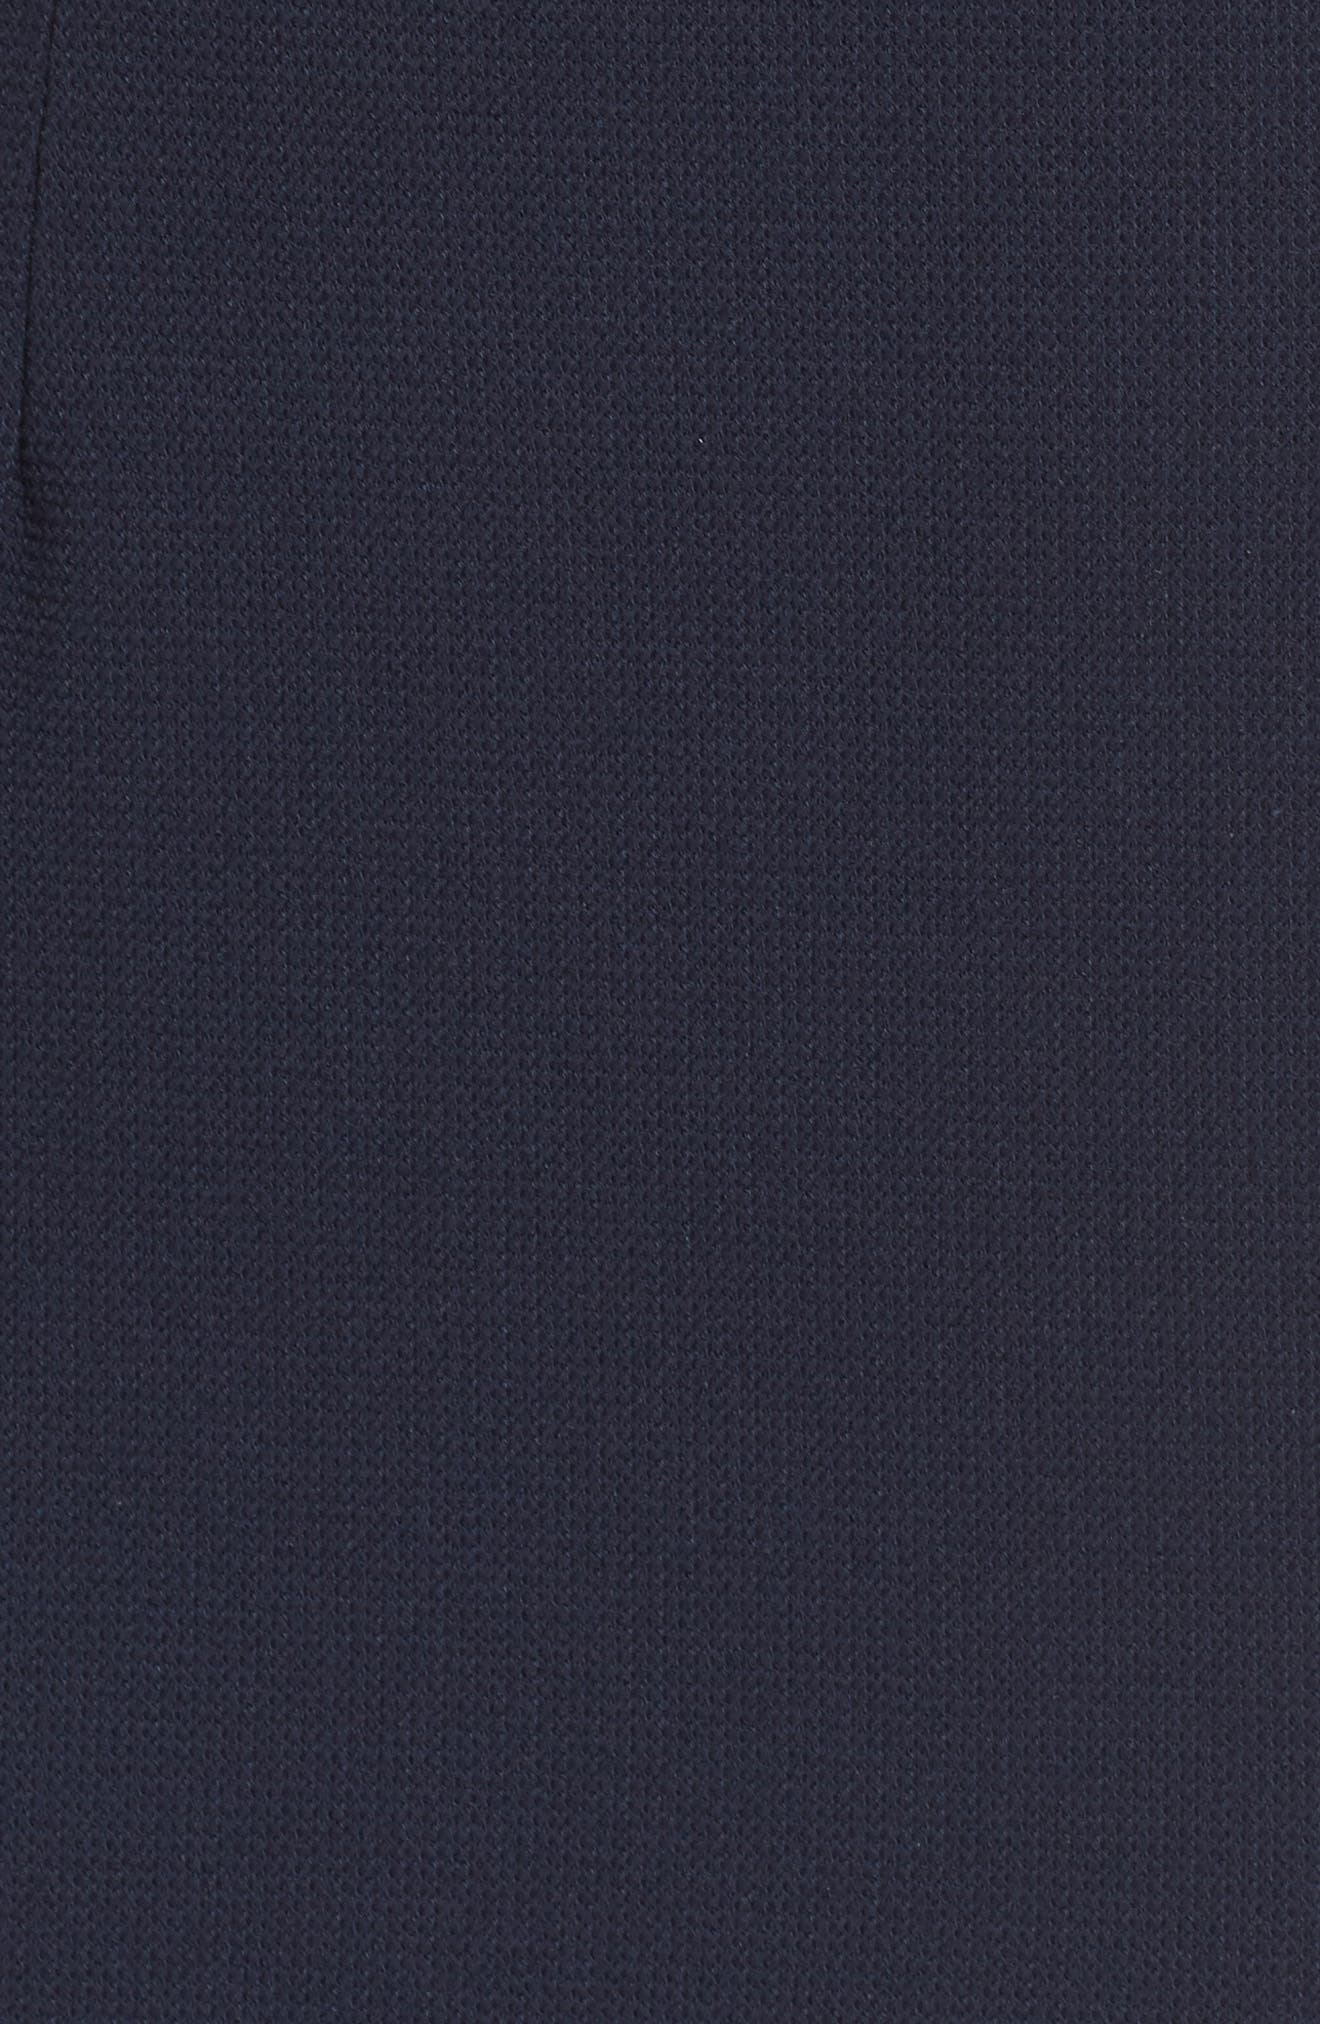 Structured Knit Asymmetrical Trumpet Midi Dress,                             Alternate thumbnail 5, color,                             411